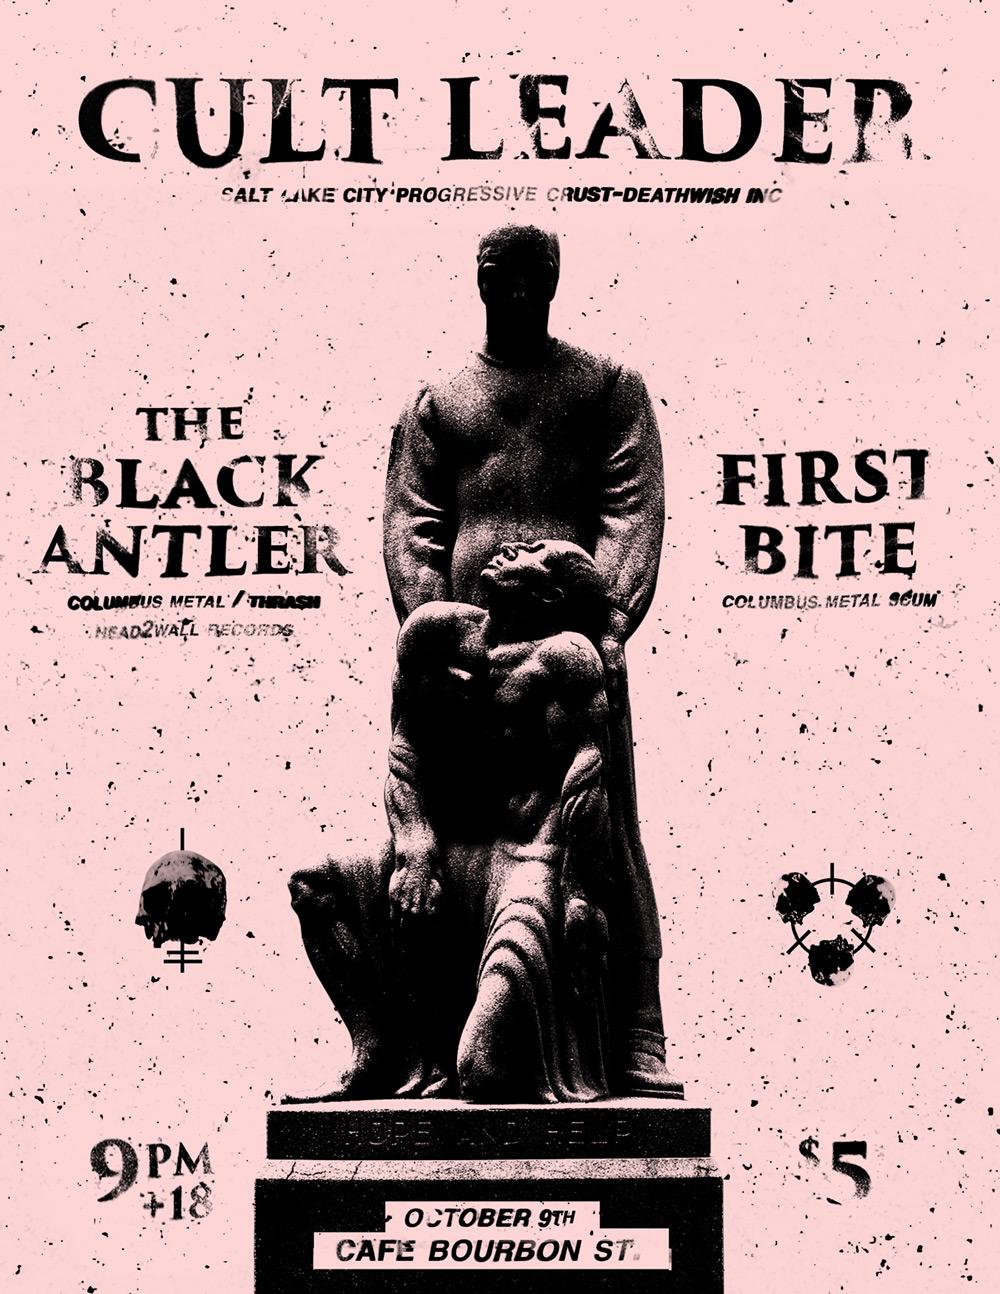 Flyer w/ Cult Leader